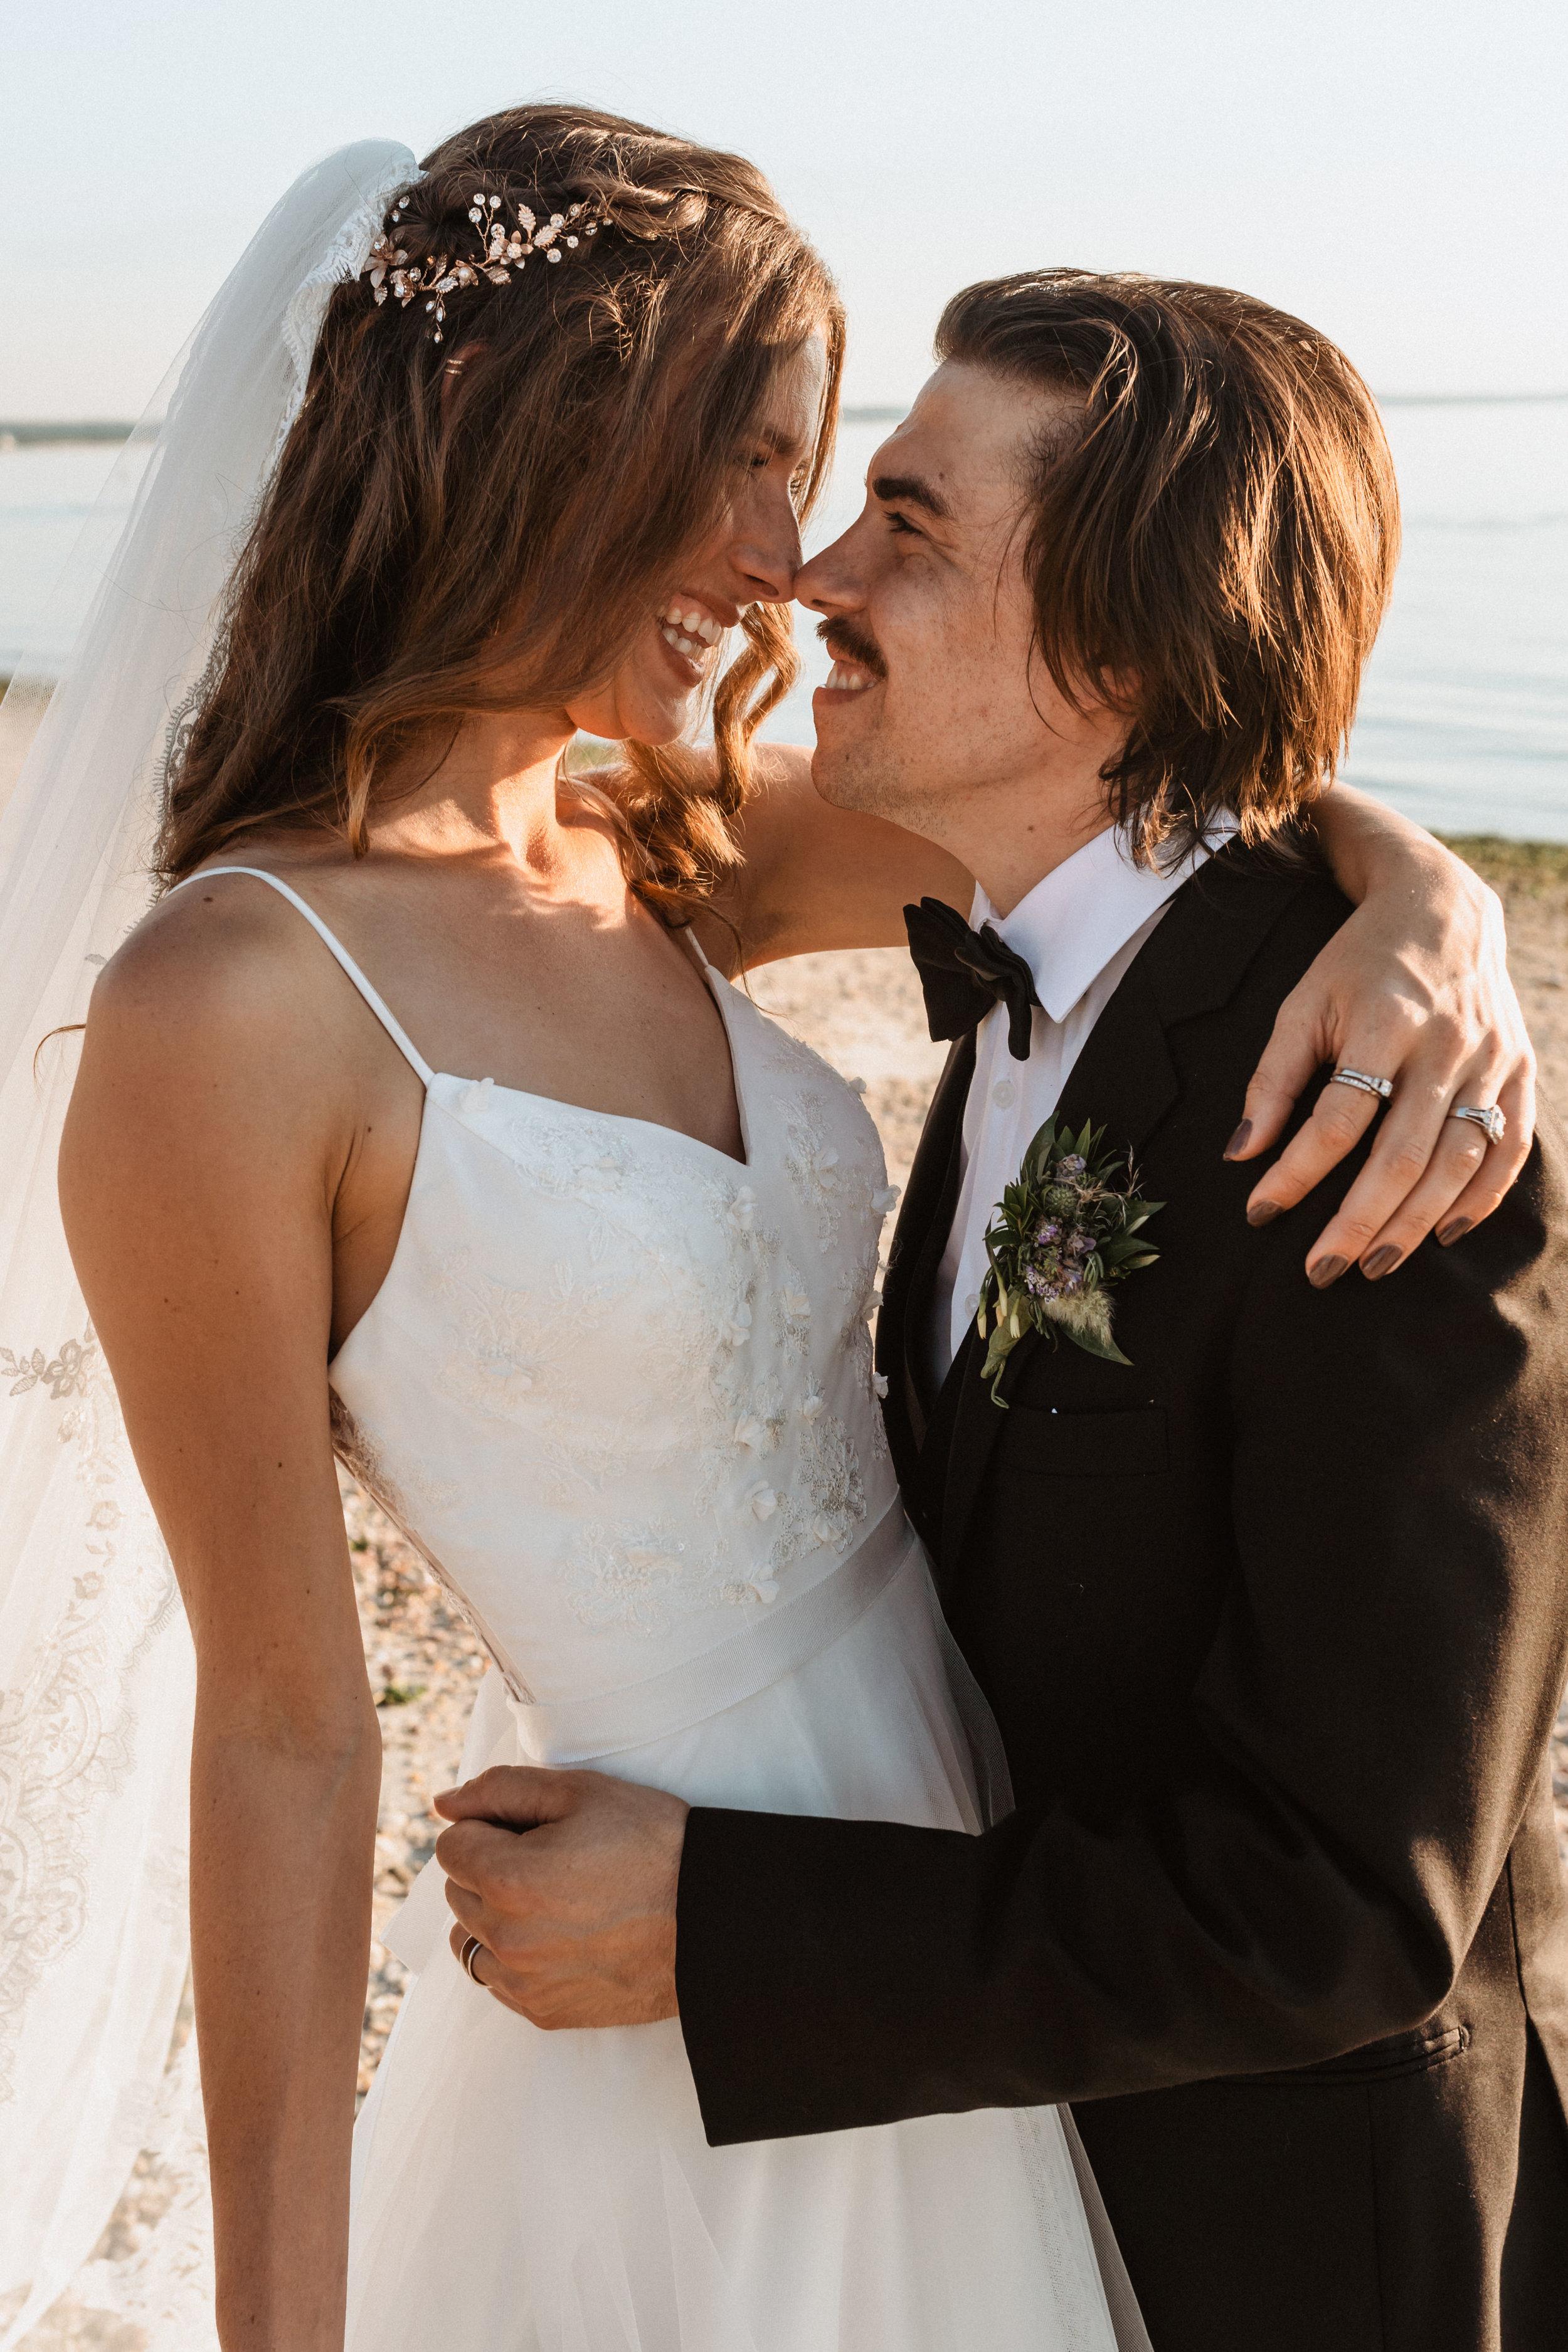 625_JJP_2019_Emily&Joey_Summer_Old Field Club Wedding_Bridals.jpg